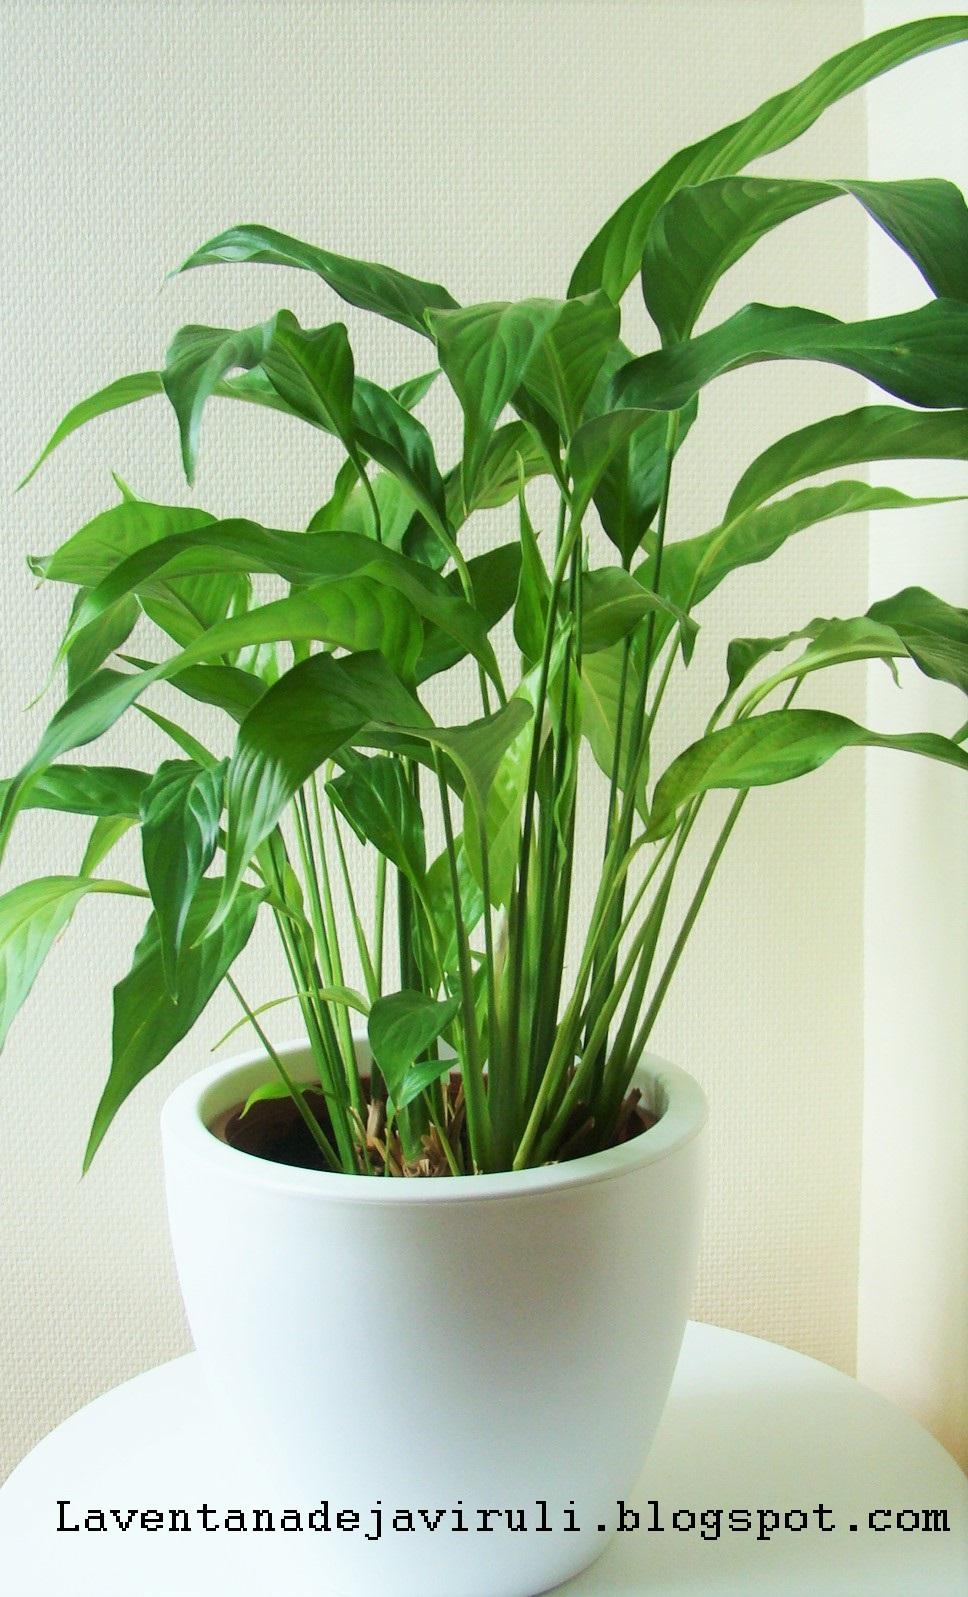 La ventana de javiruli plantas de interior 40 espatifilo cuna de moises spathiphyllum - Planta cuna de moises ...